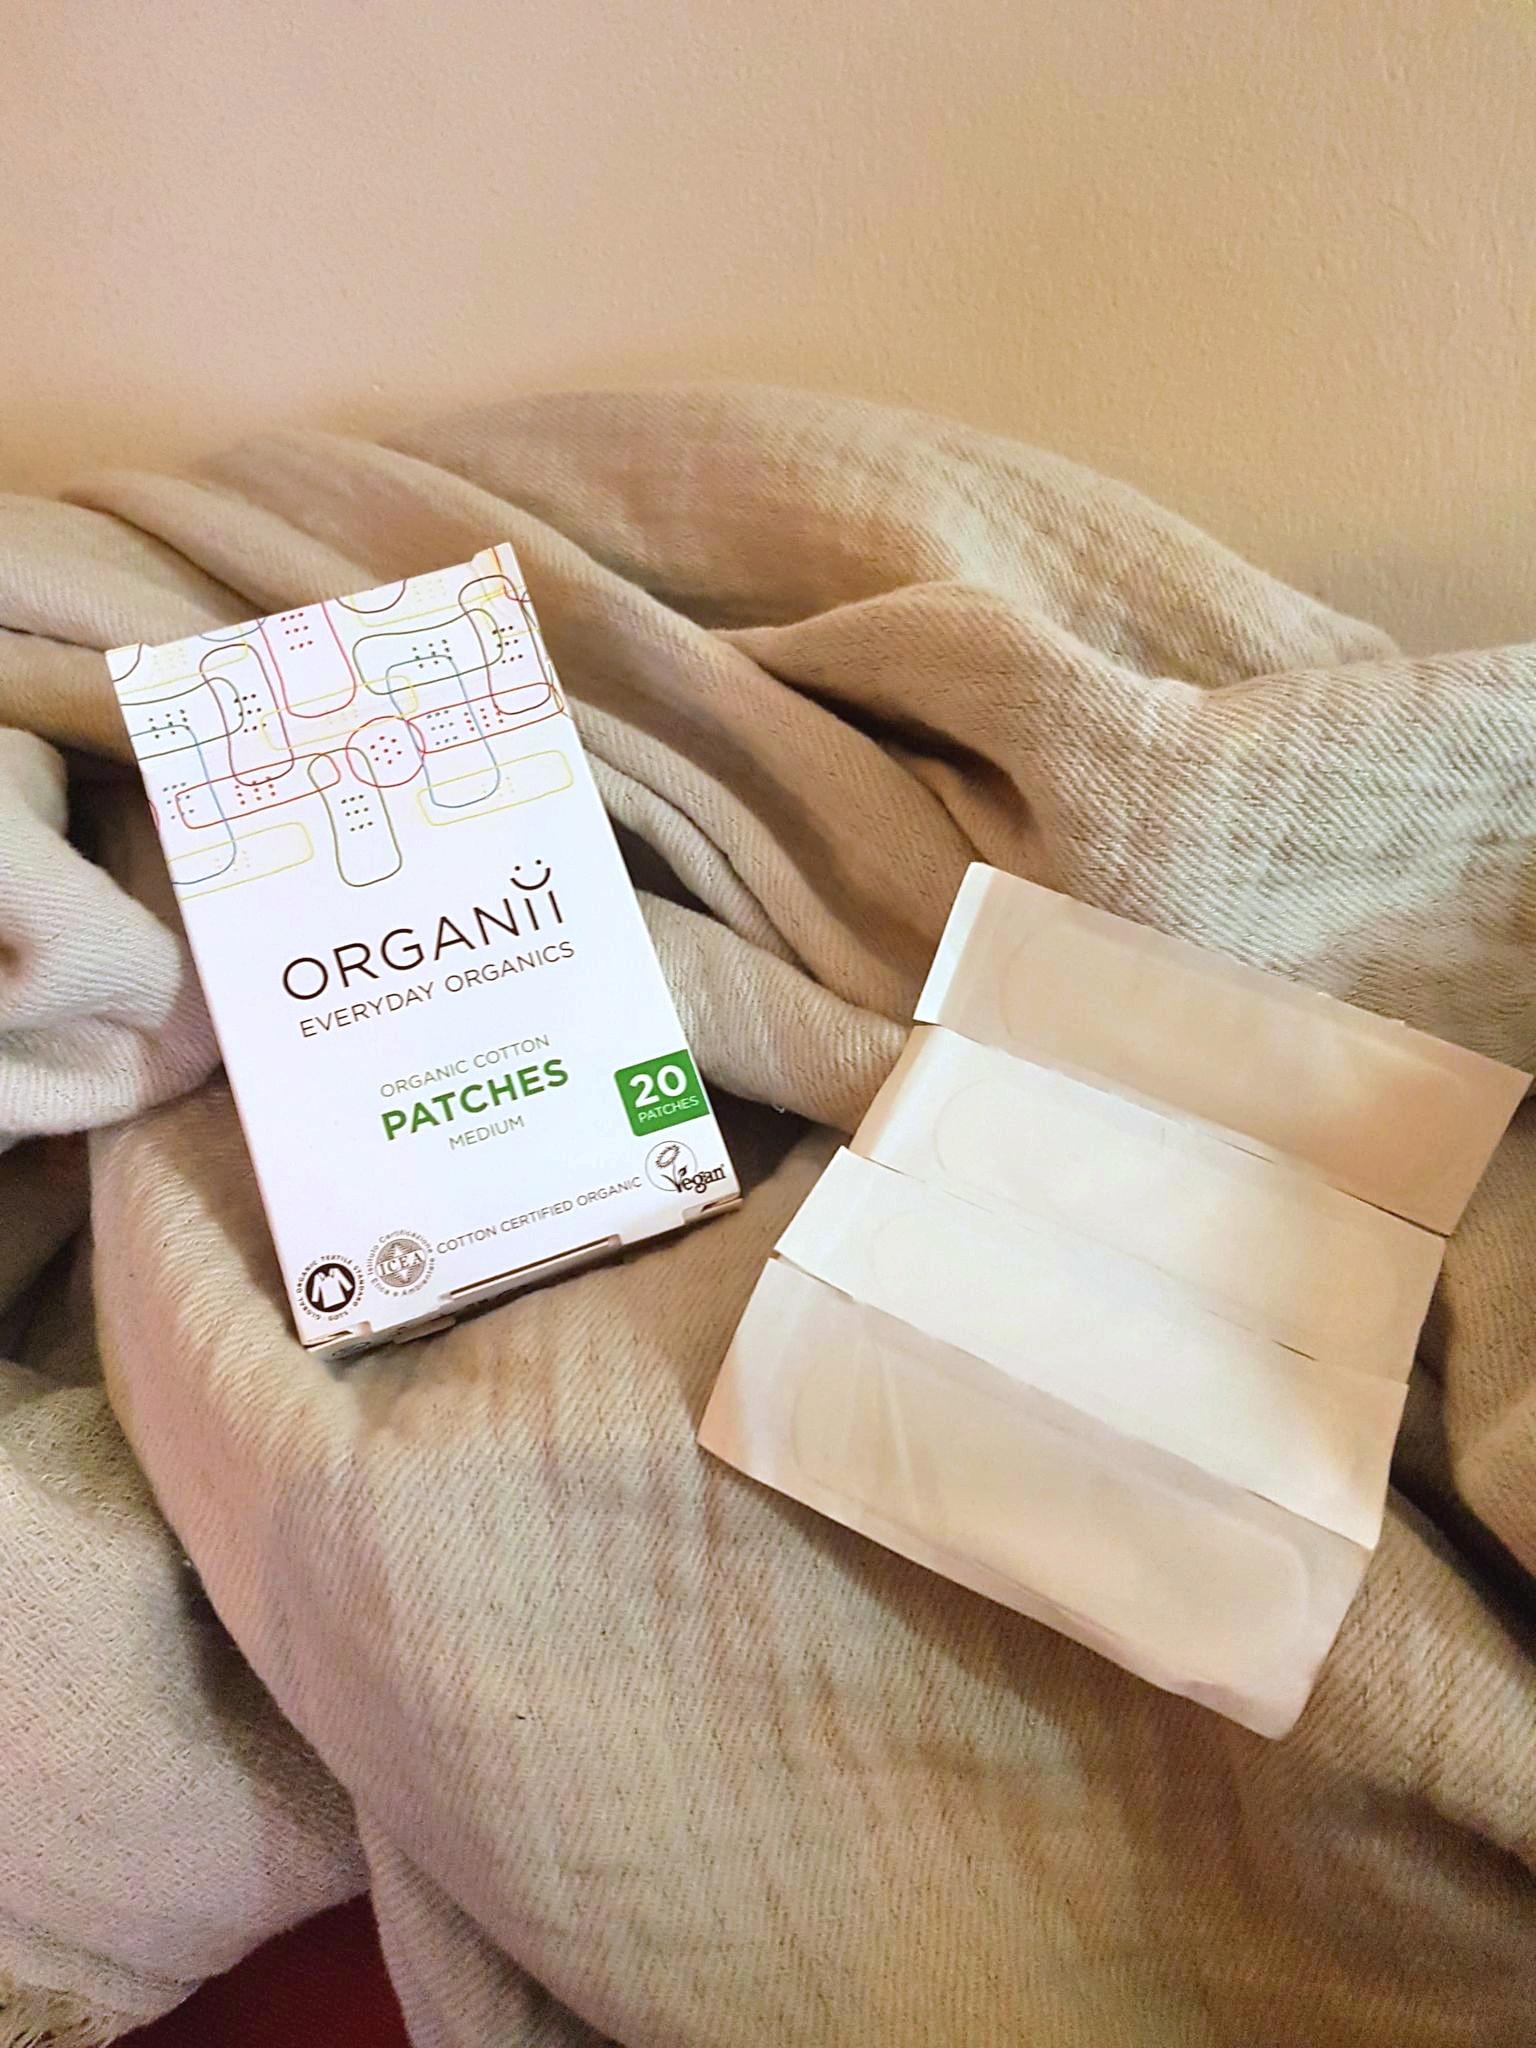 box of organic cotton plasters sitting on light blue throw blanket